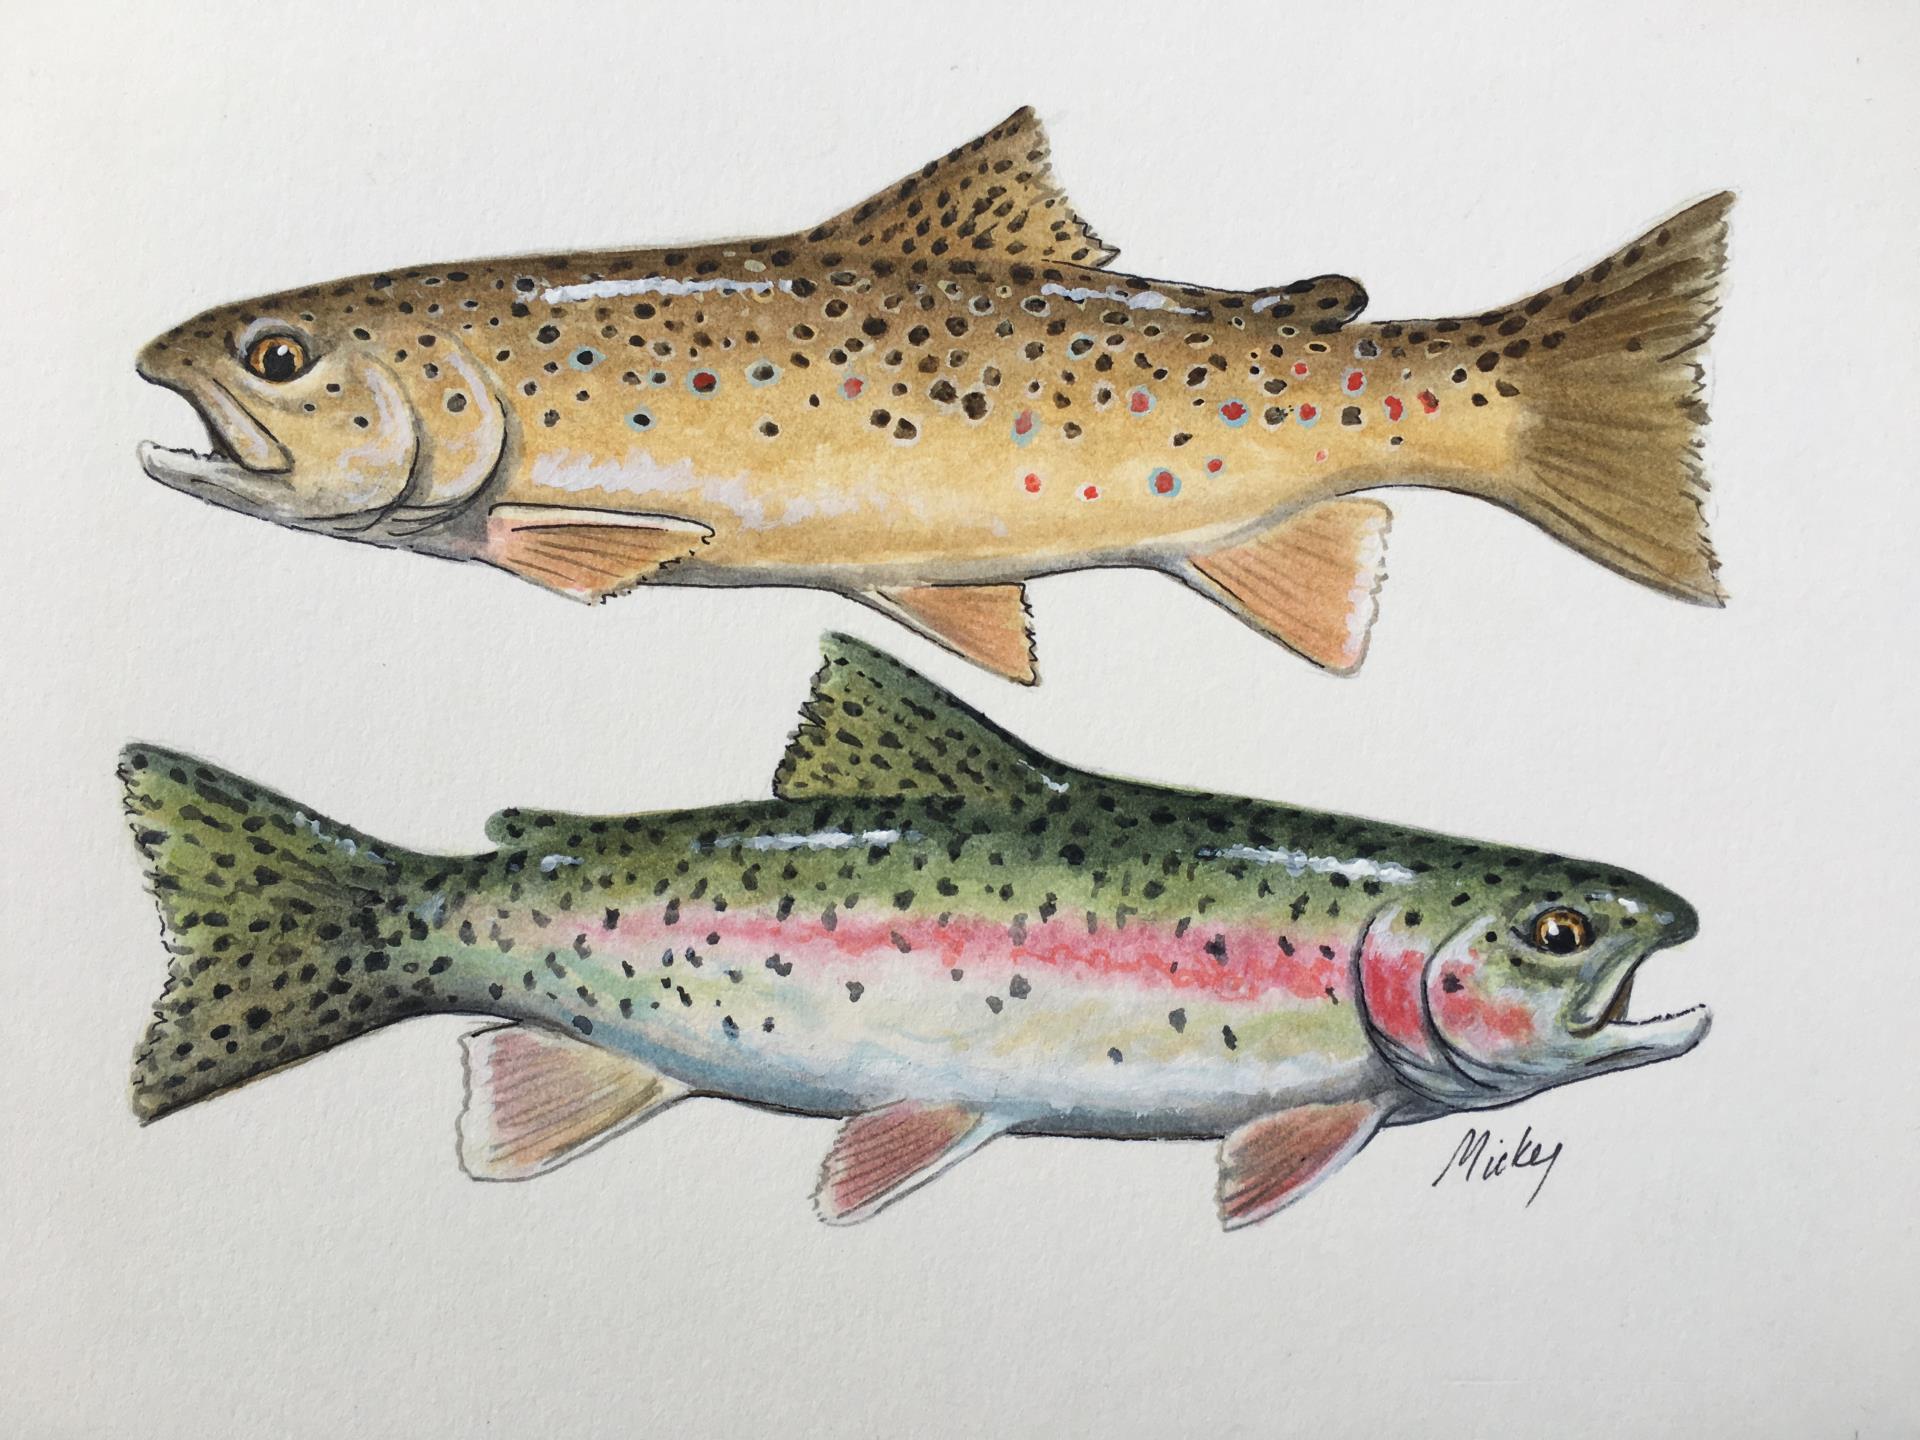 Fishing Reports | City of Loveland